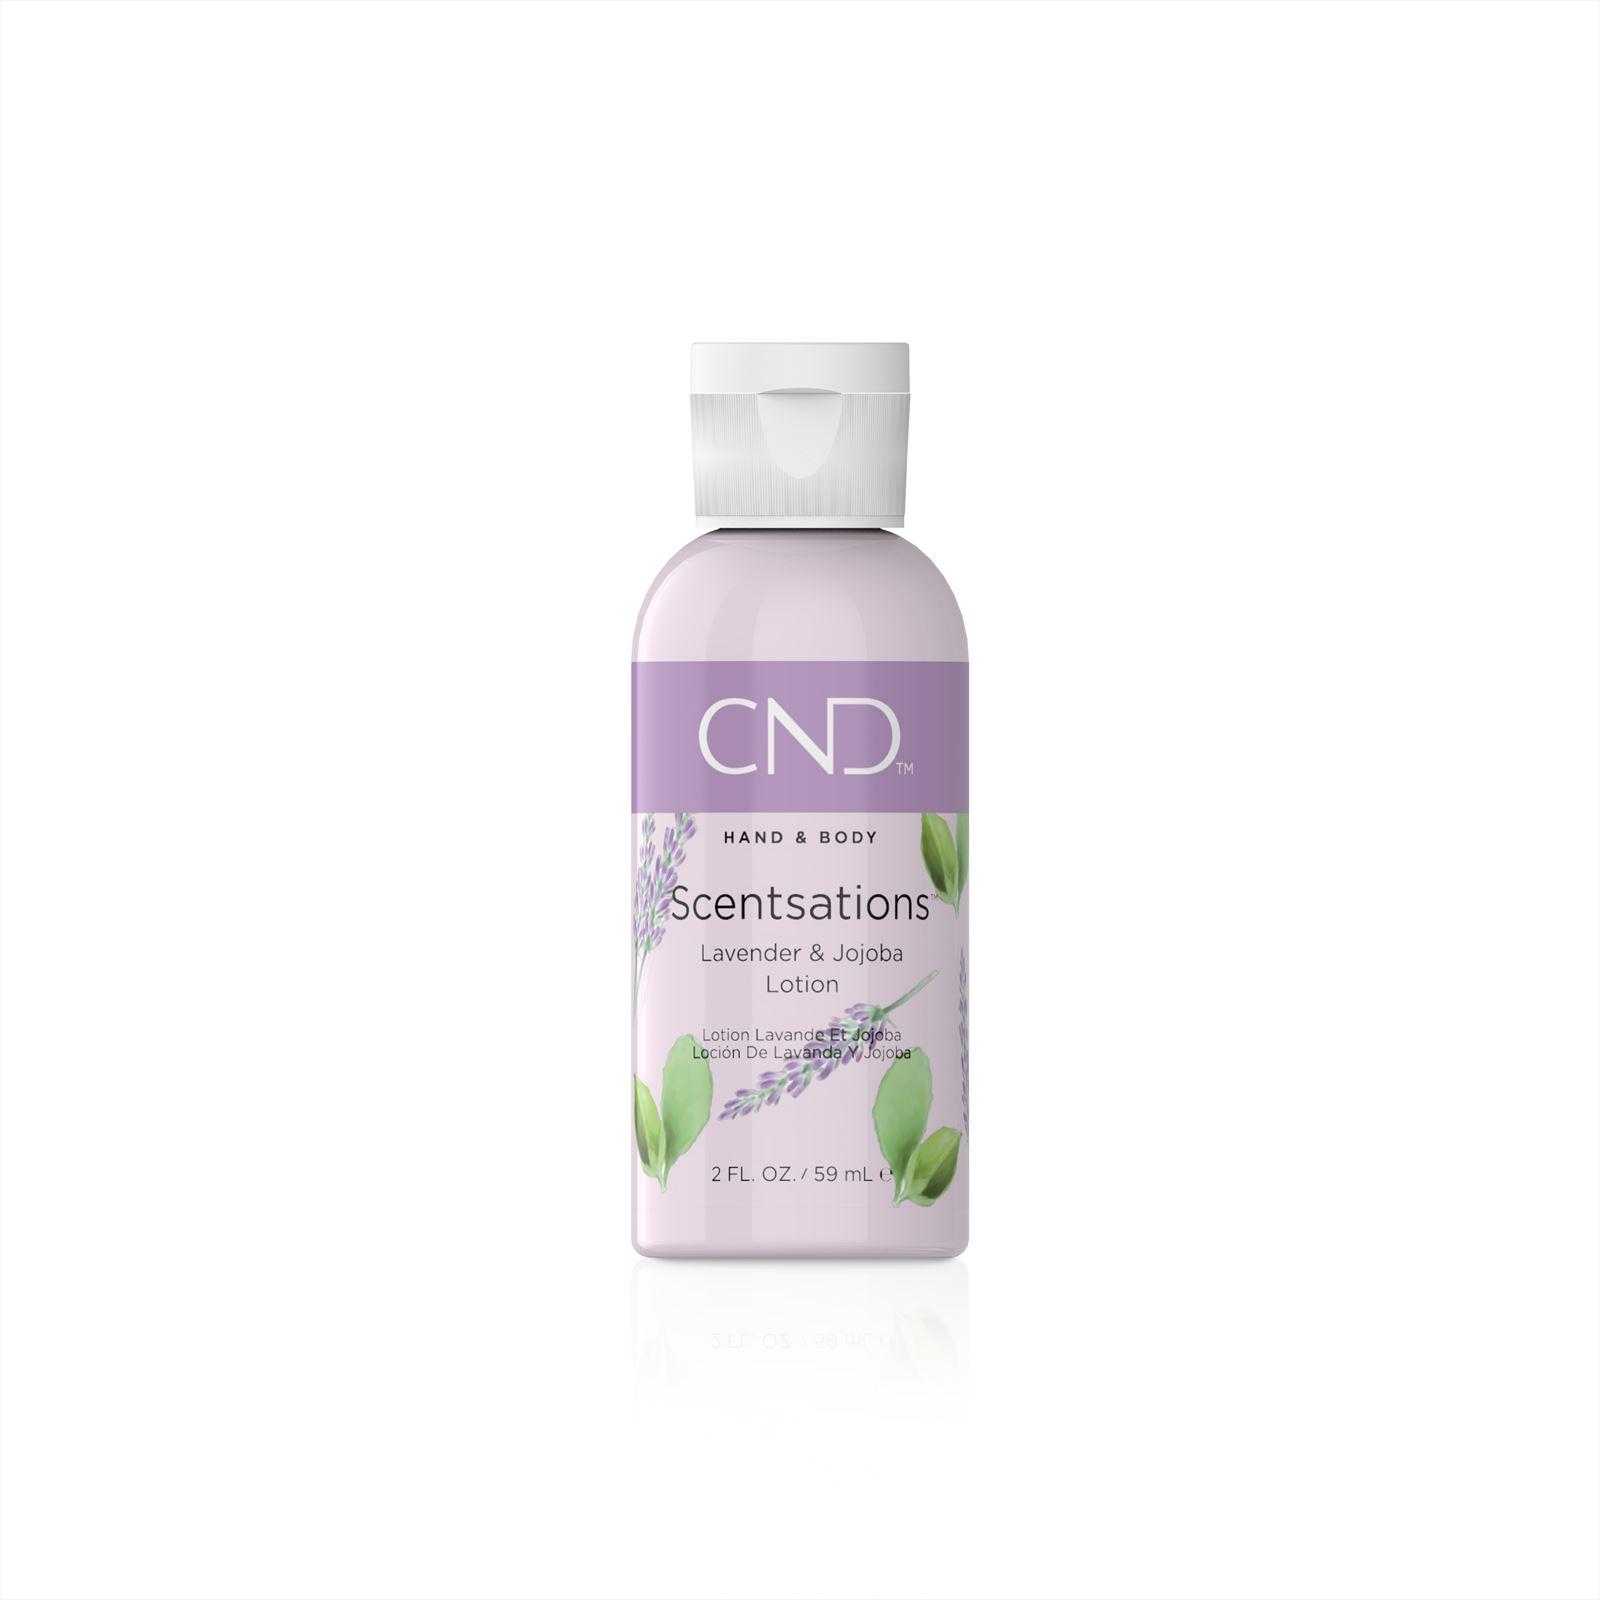 Afbeelding van CND ™ Scentsations Lotion - Lavender & Jojoba 59 ml